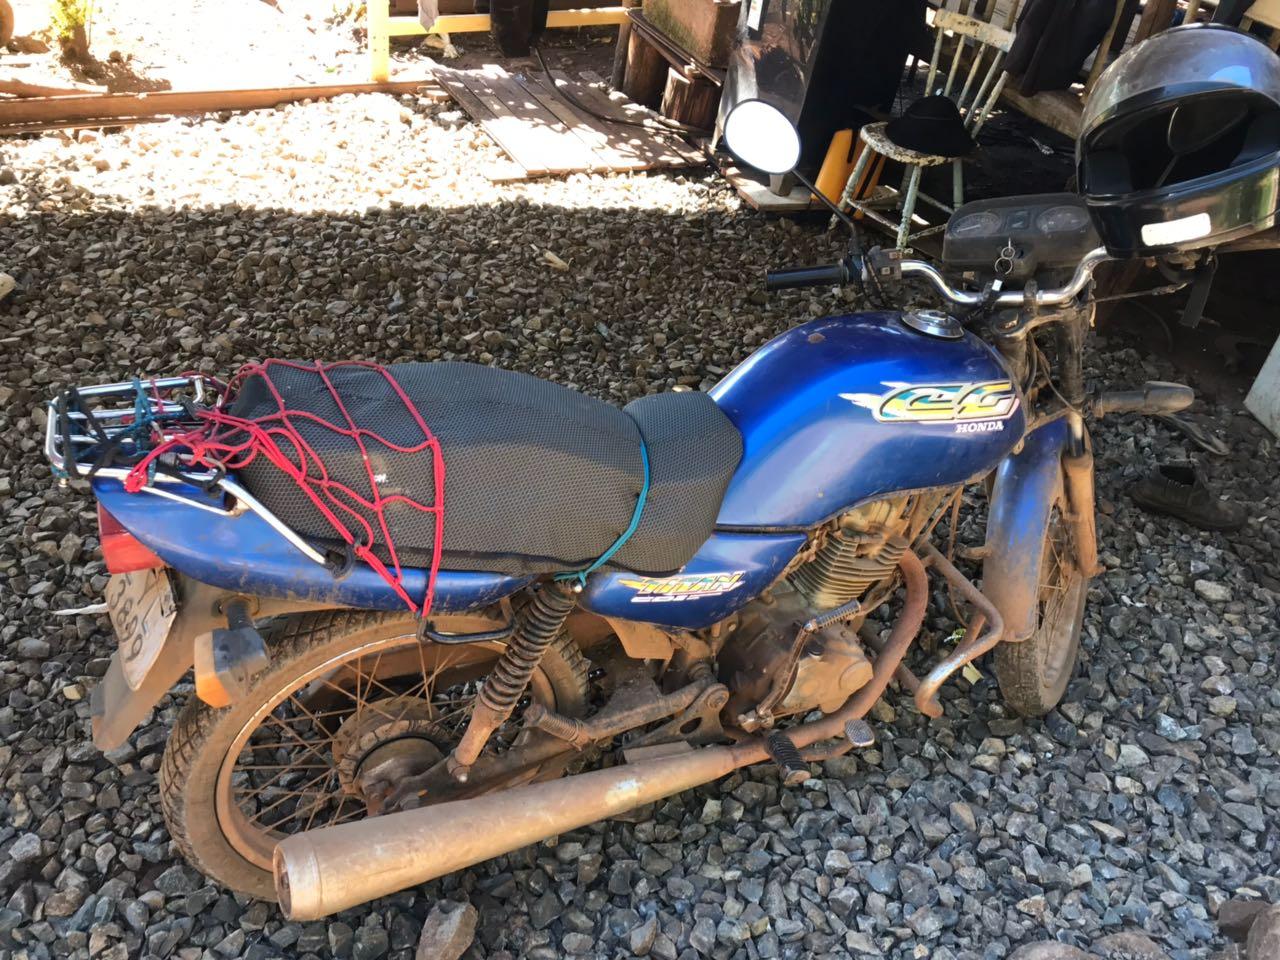 Polícia Civil de Maravilha recupera motocicleta furtada